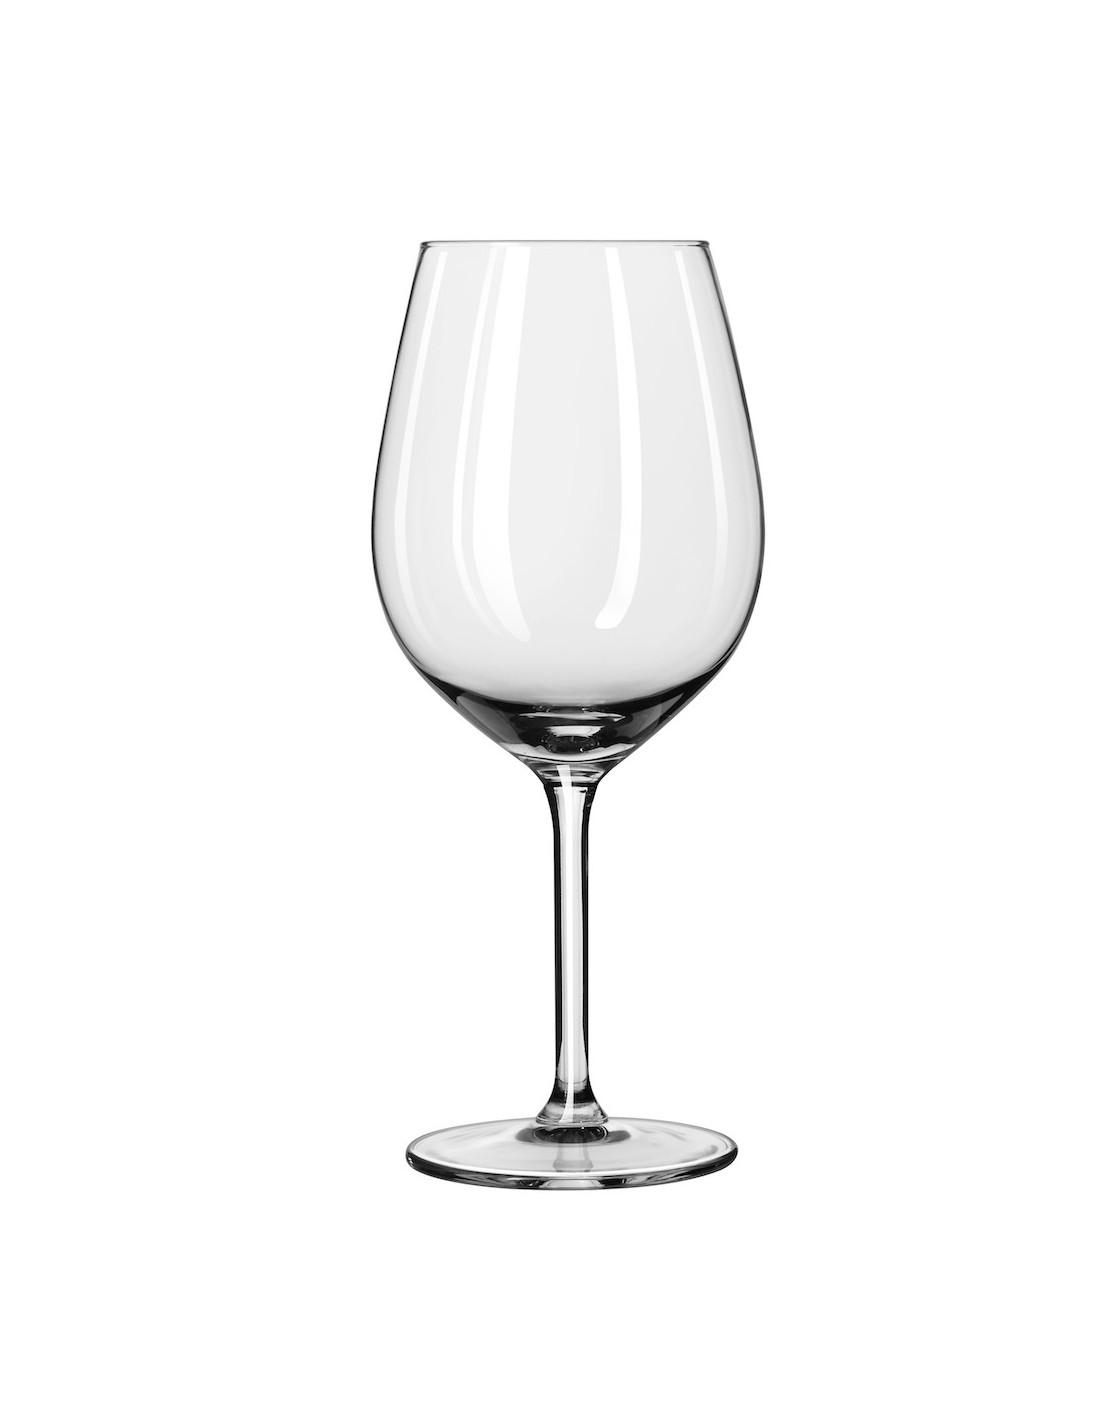 Copa vino fortius 17 2 oz crisa 241020 for Copa vino tinto